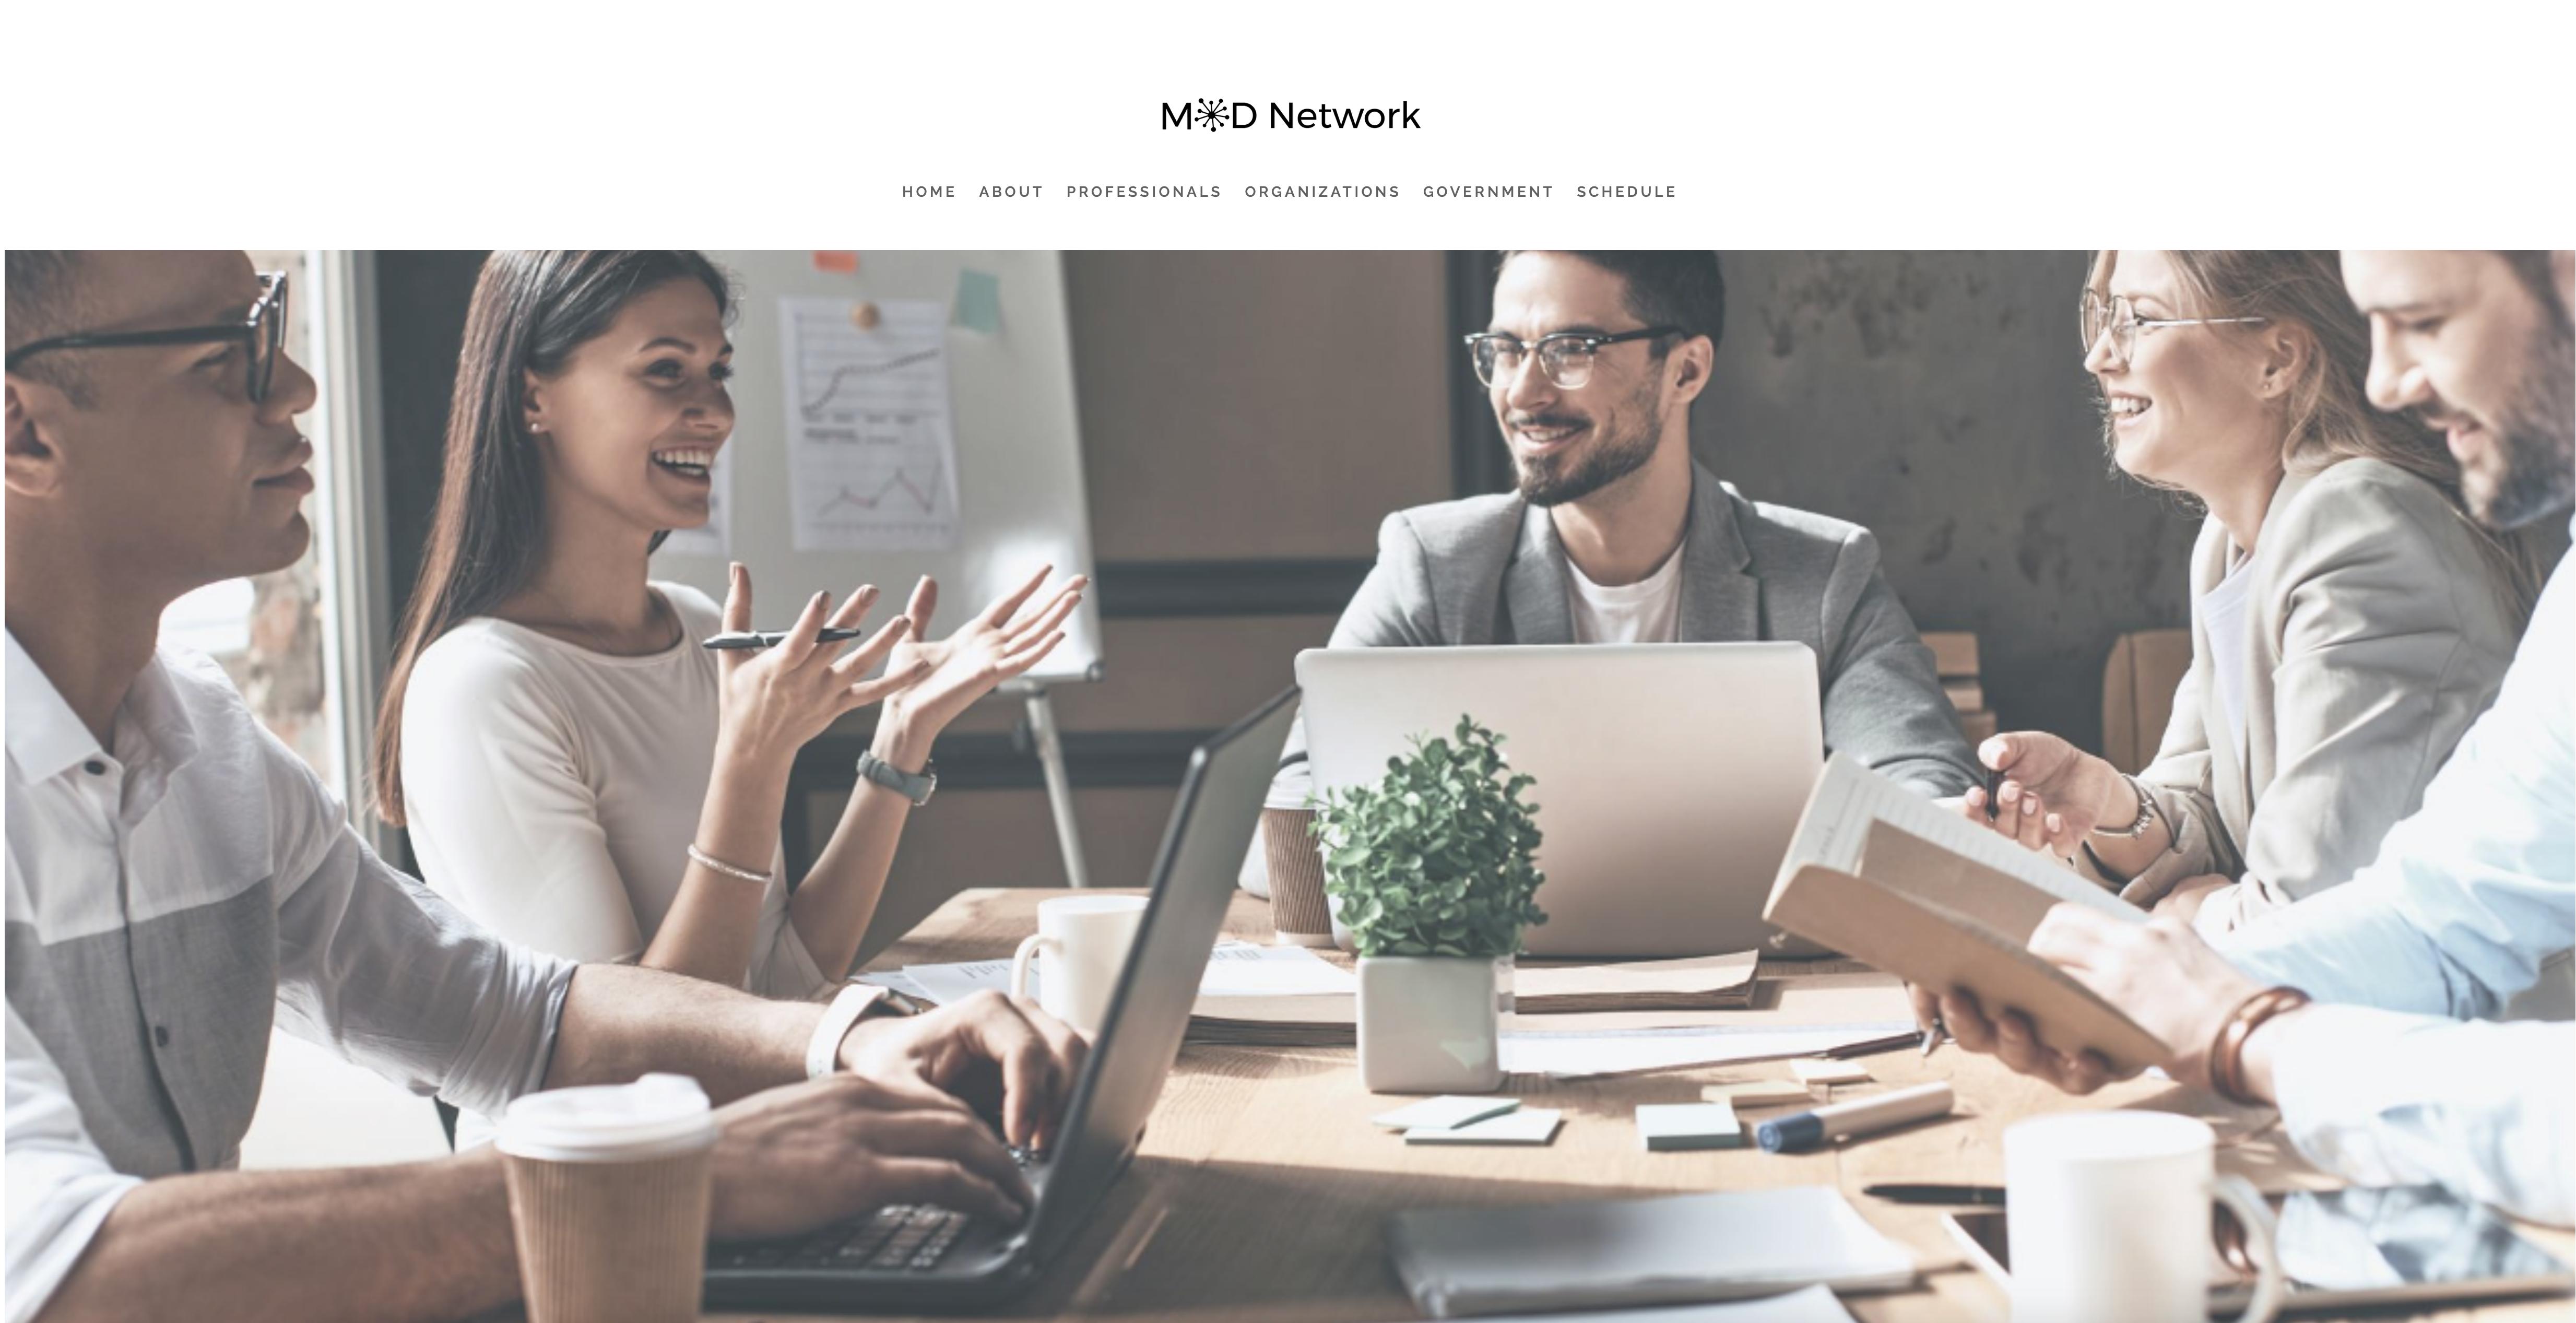 ModNetwork Website - Executive Coaching